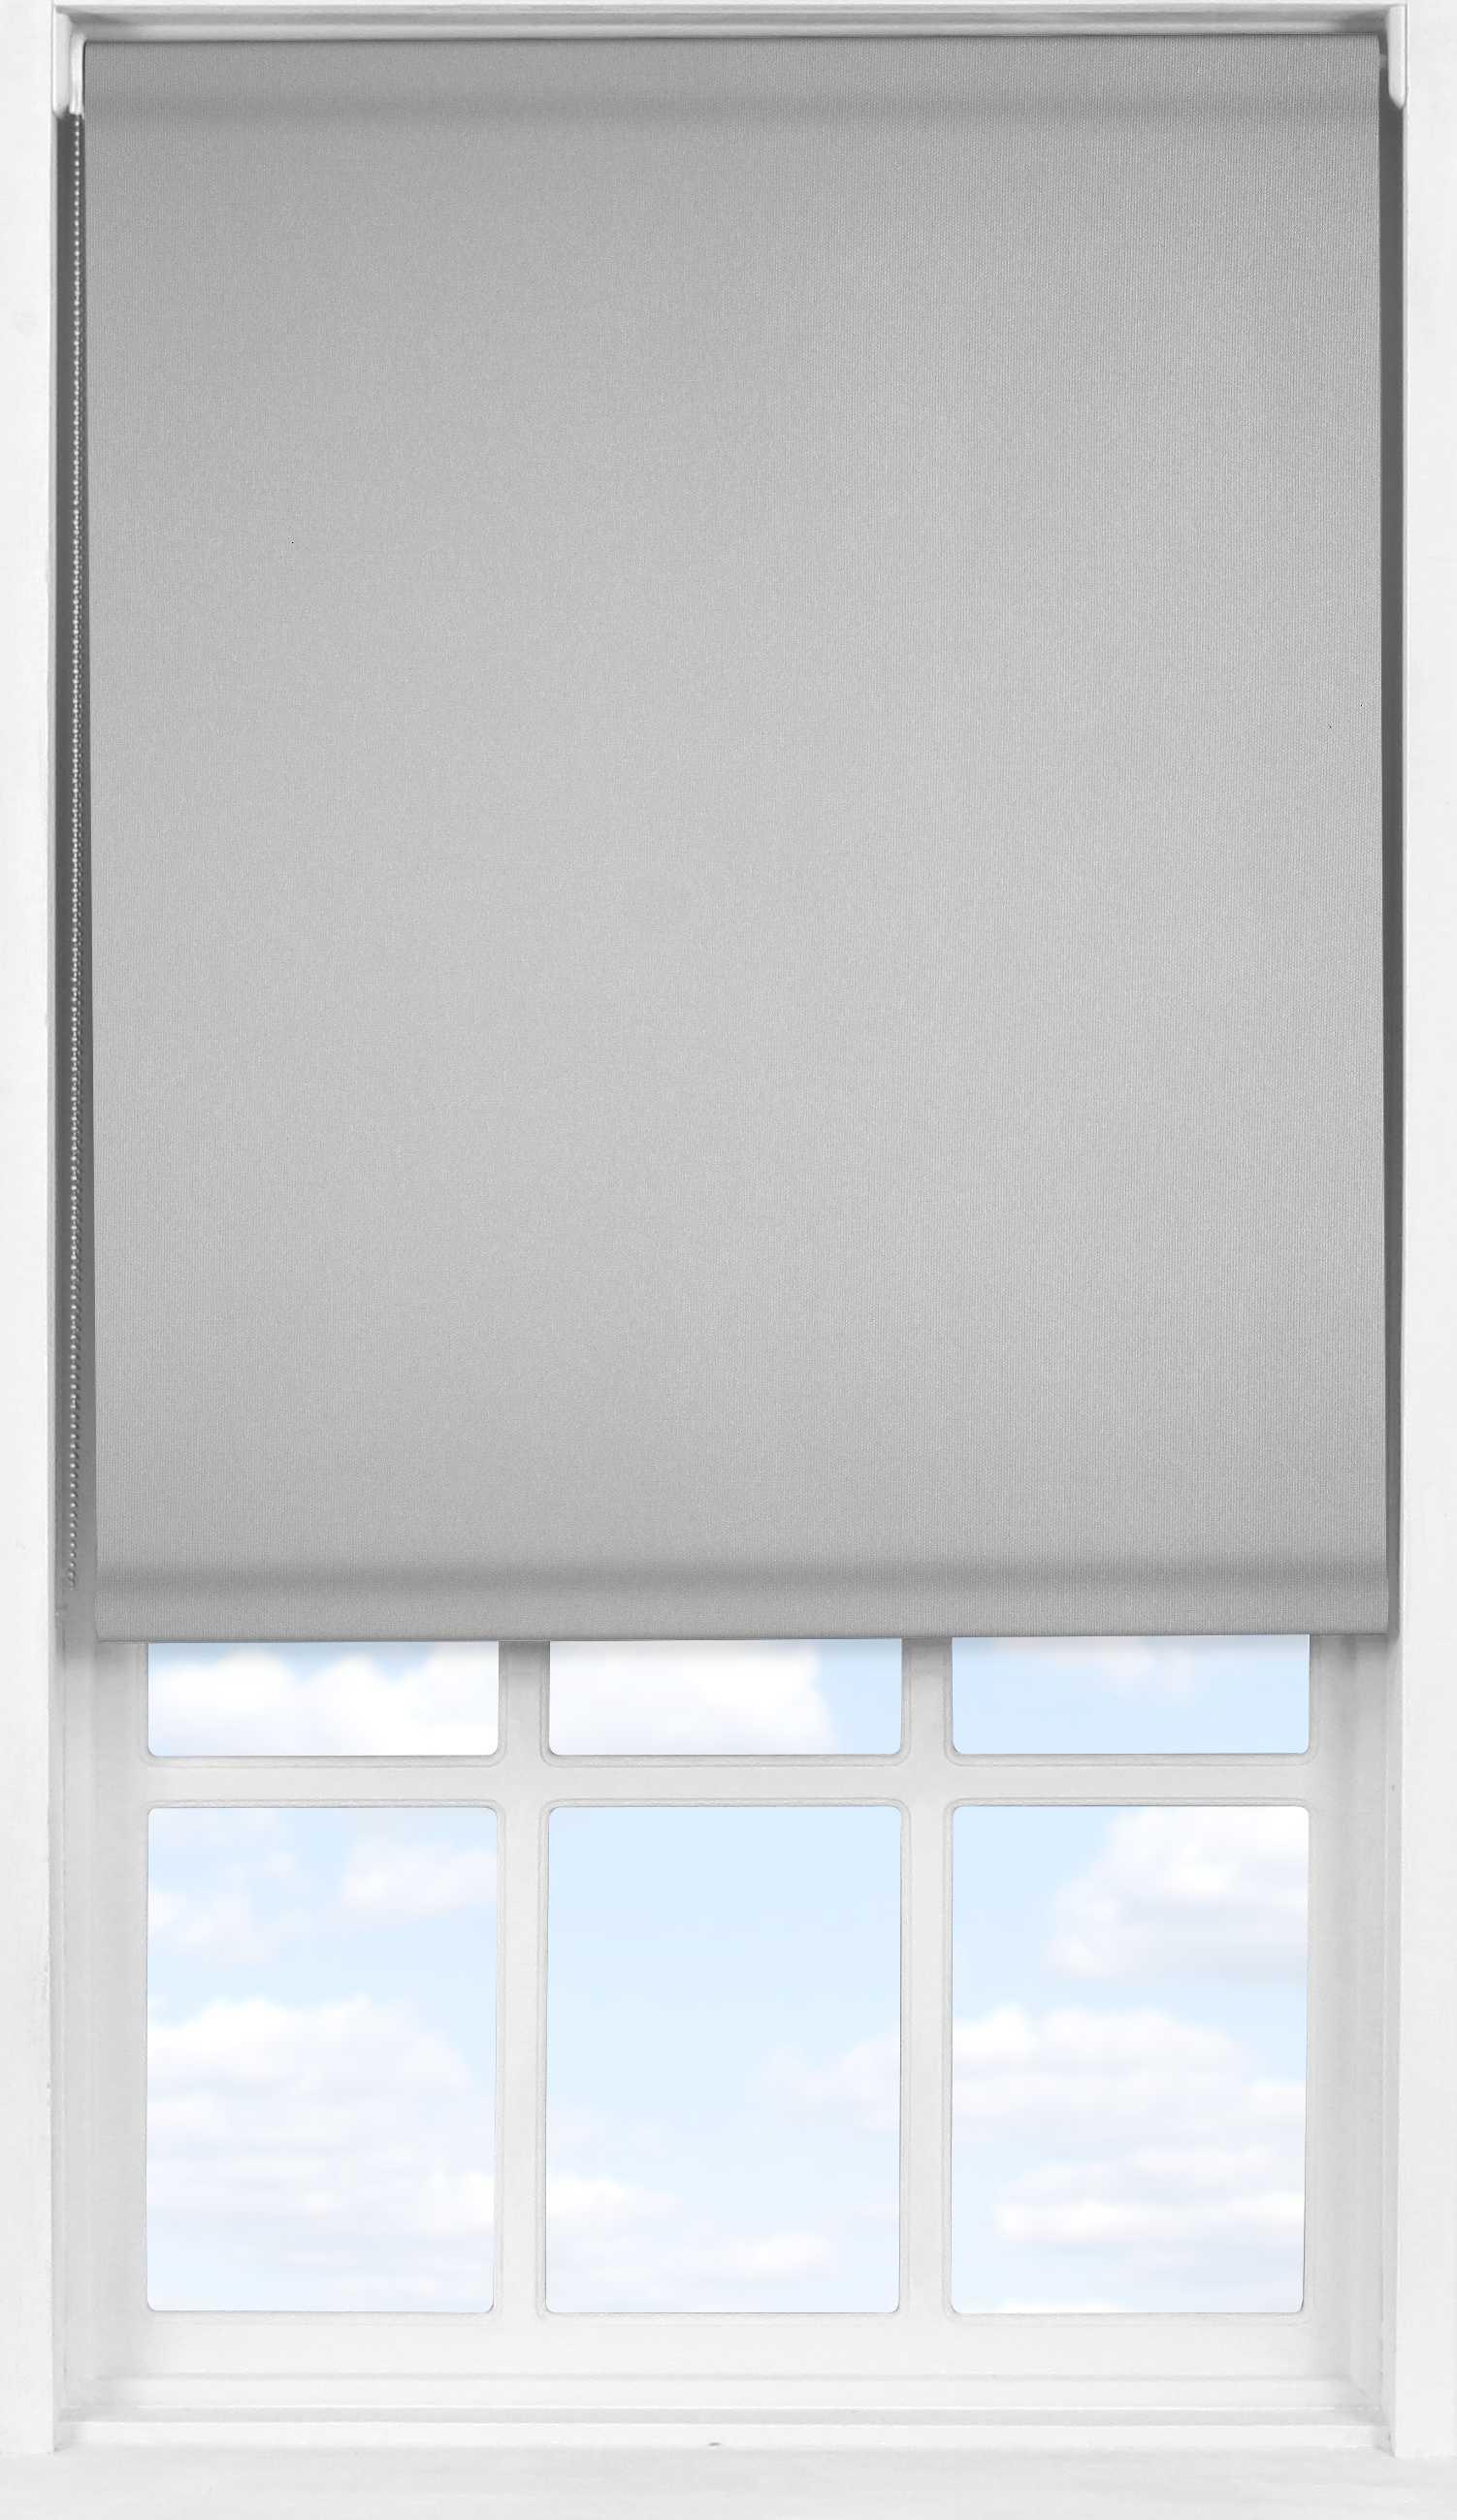 Easifit Roller Blind in PVC Grey